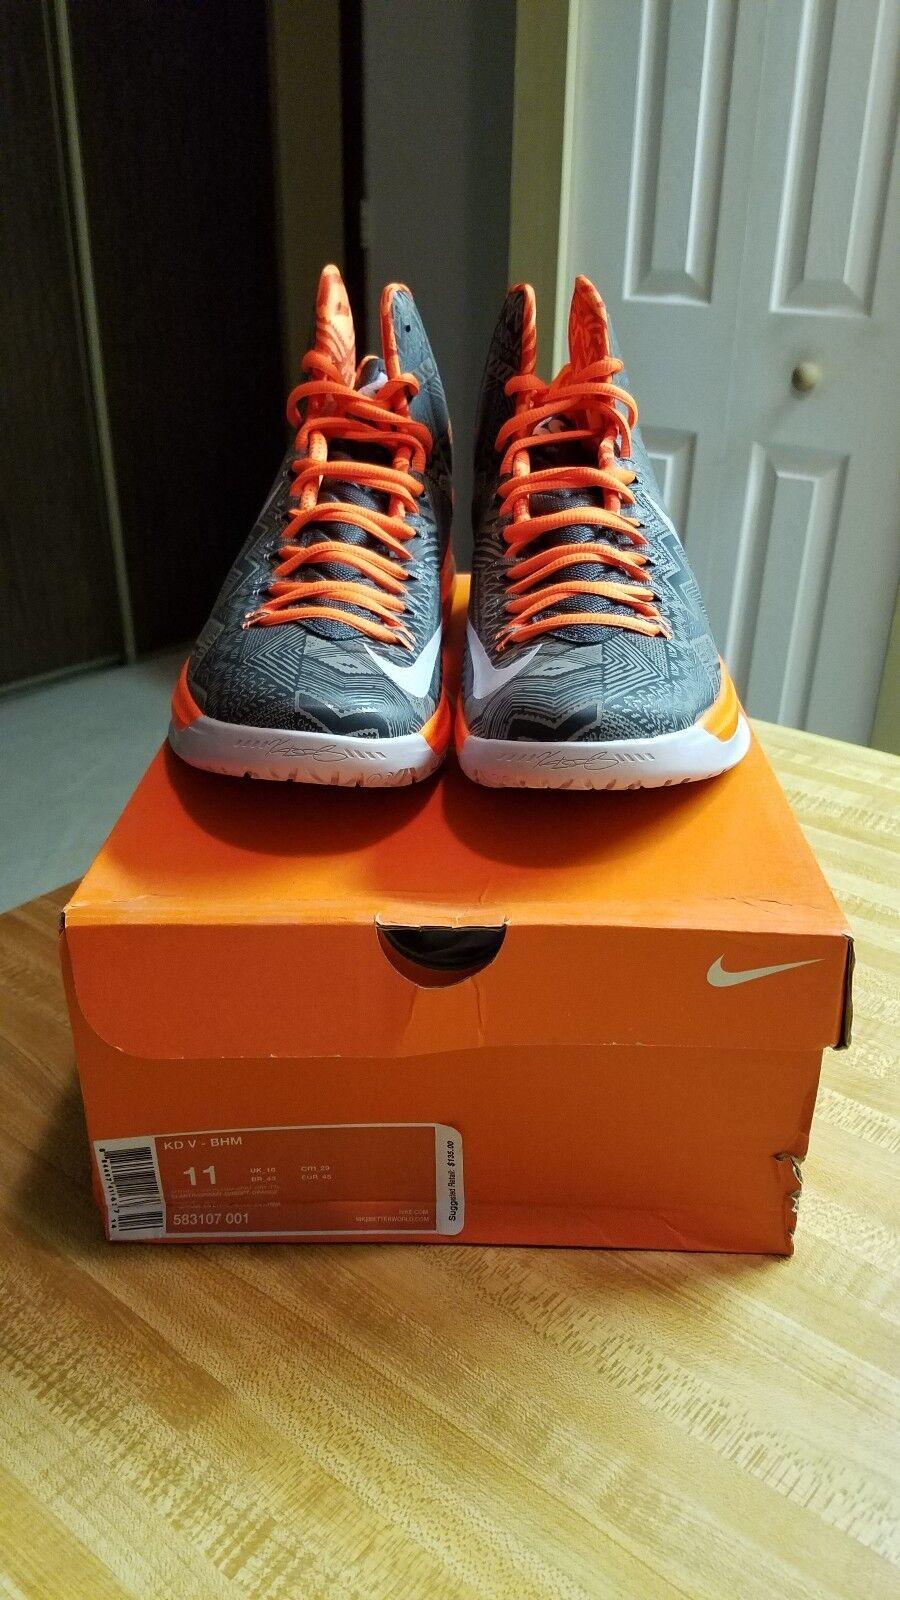 Nike Kd 5 BHM brand new deadstock reflective basketball.